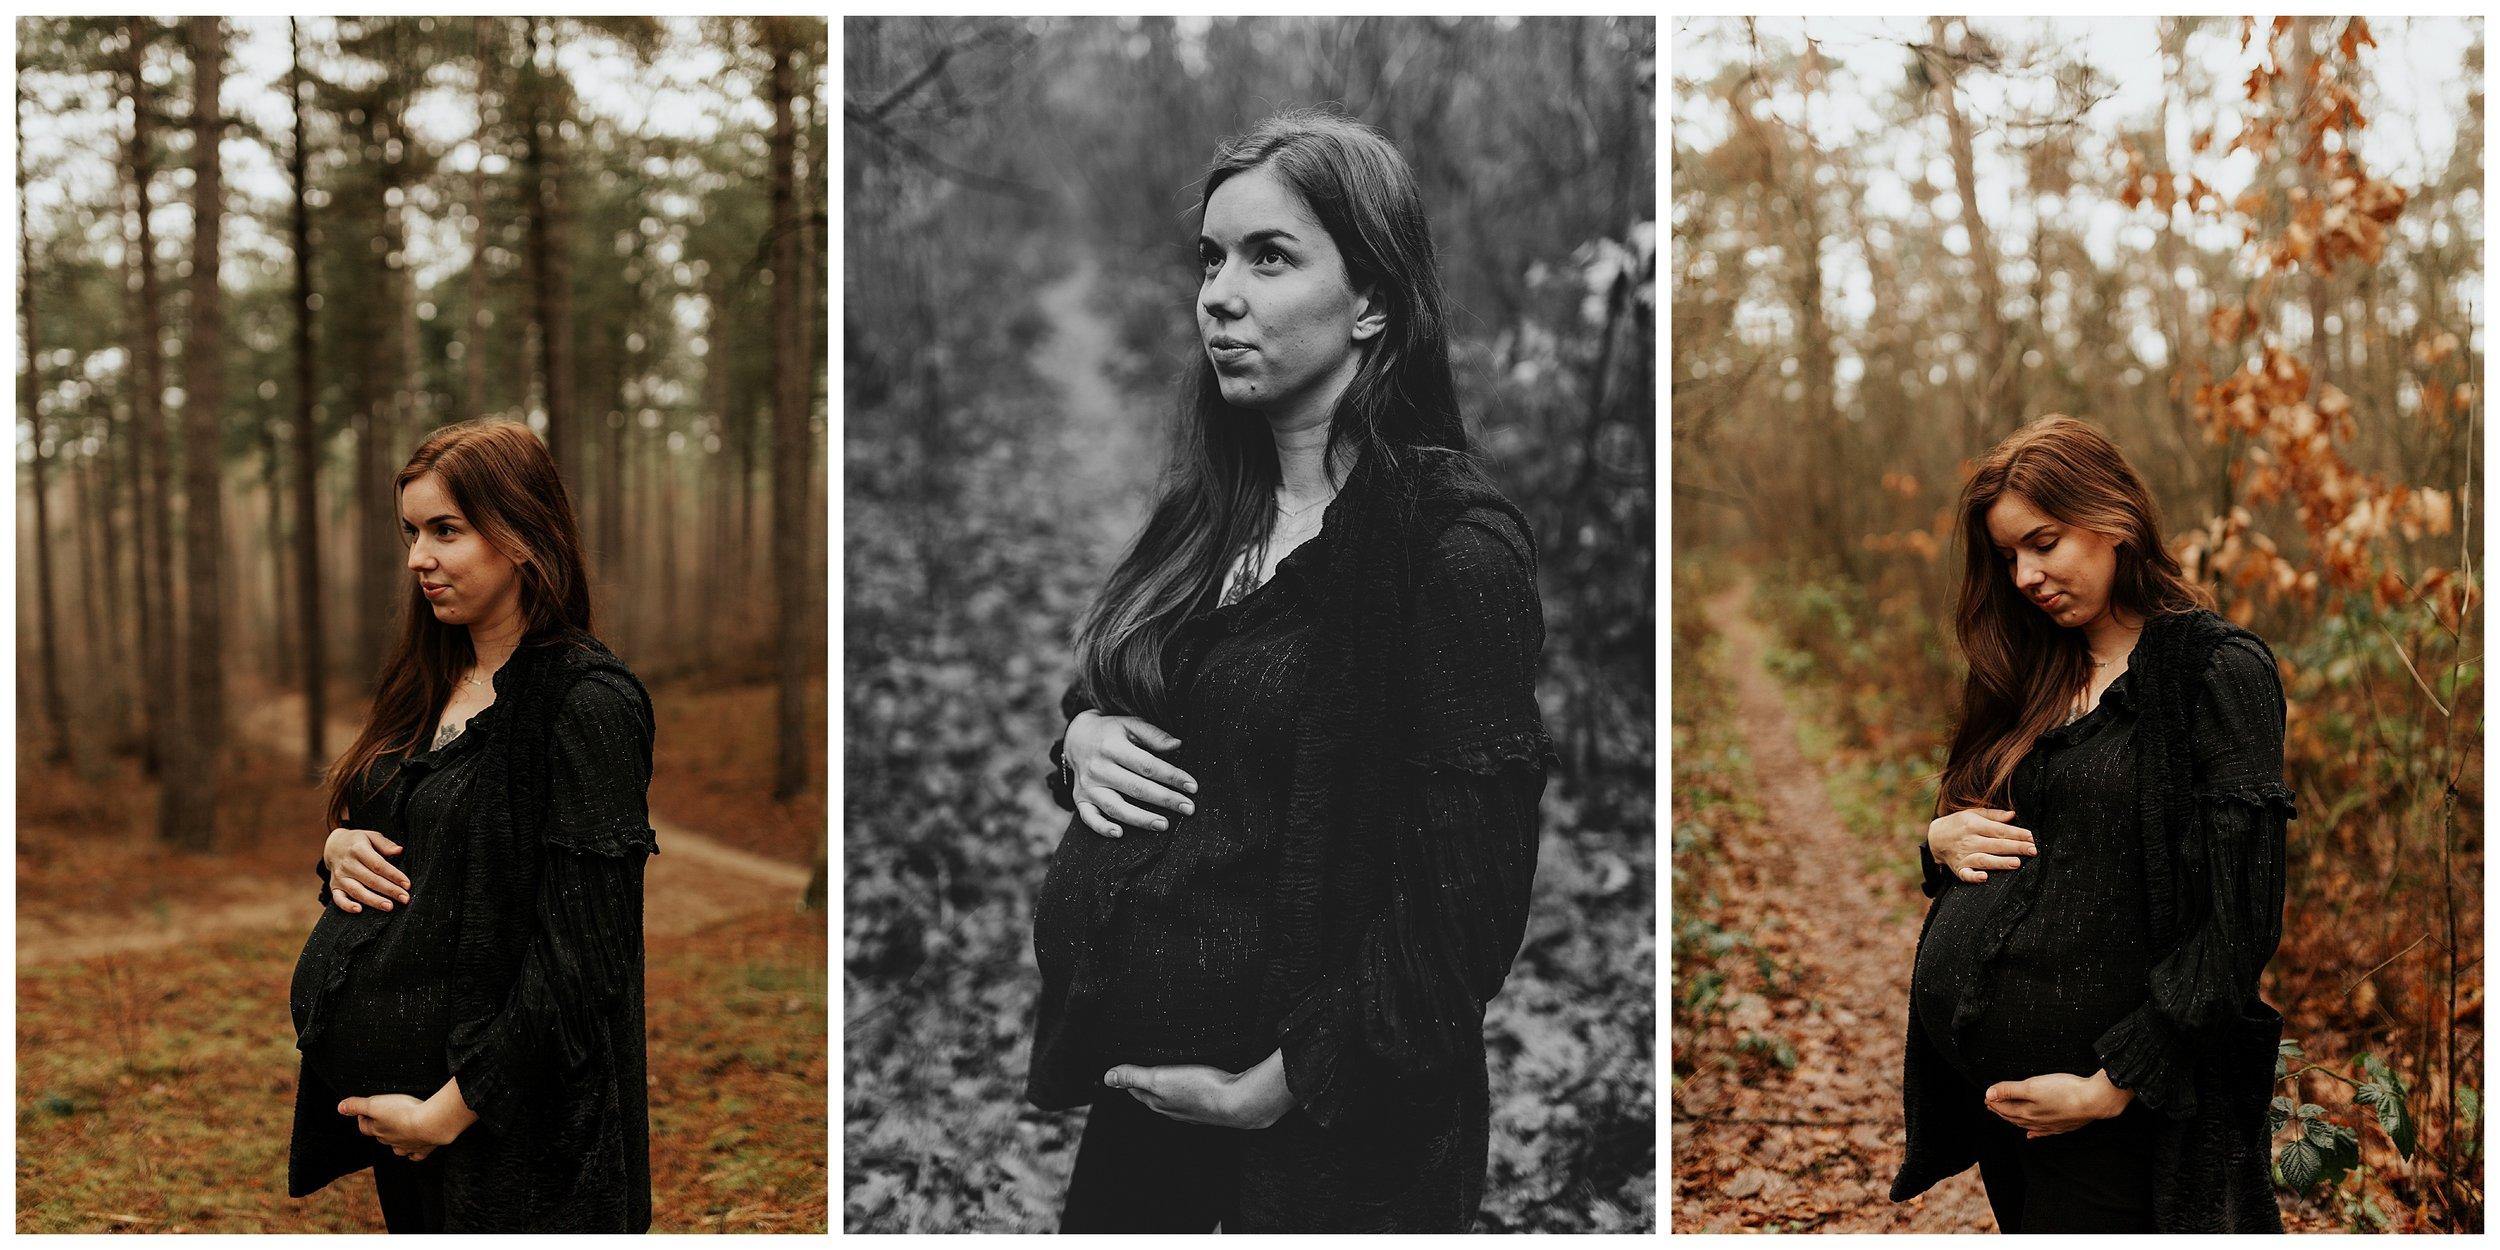 zwangerschapsfotografie-michelle-lisa-helsen-zwangerschapsfotograaf-zwangerschapsfoto-kempen-herentals-antwerpen-bohemian-boho_0006.jpg